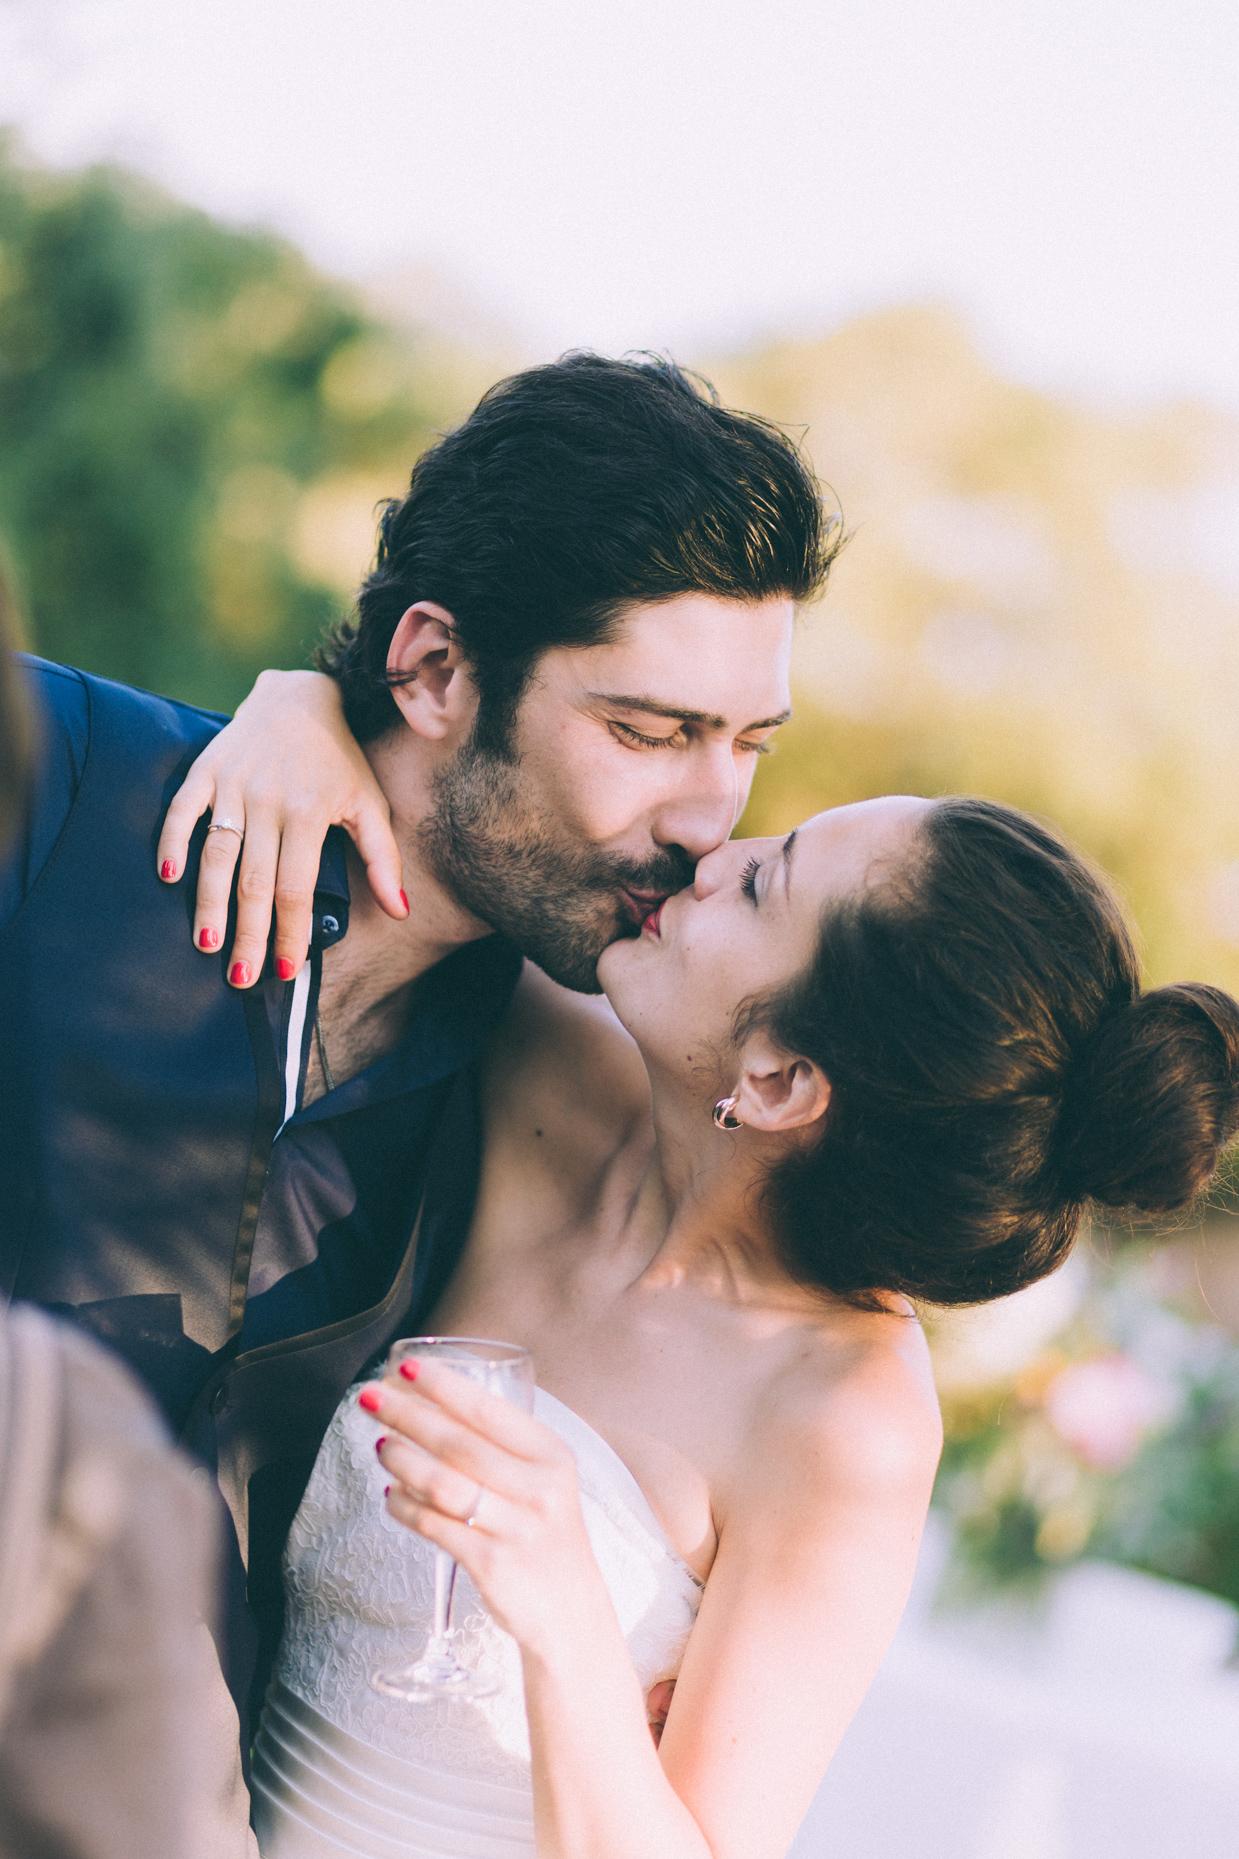 Mariage Ferme Provencale Nice Contéo